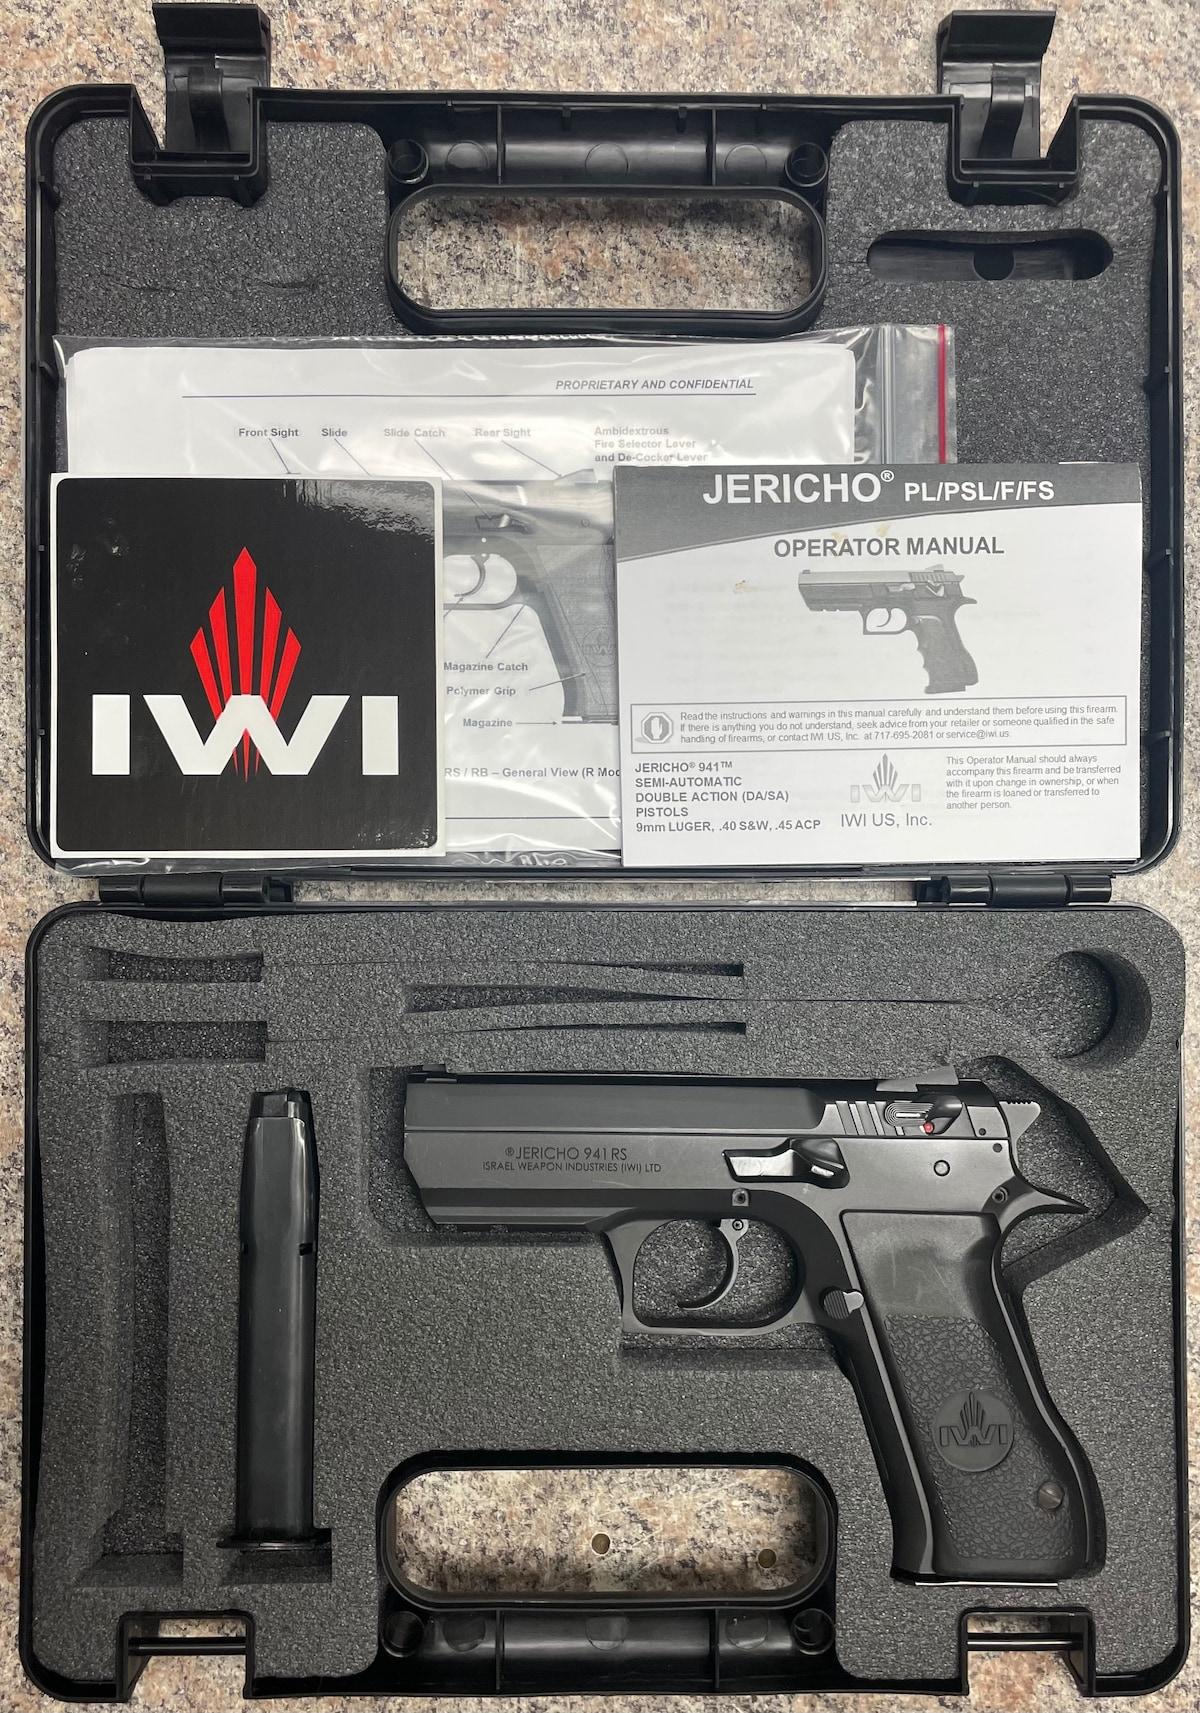 IWI JERICHO 941 RS